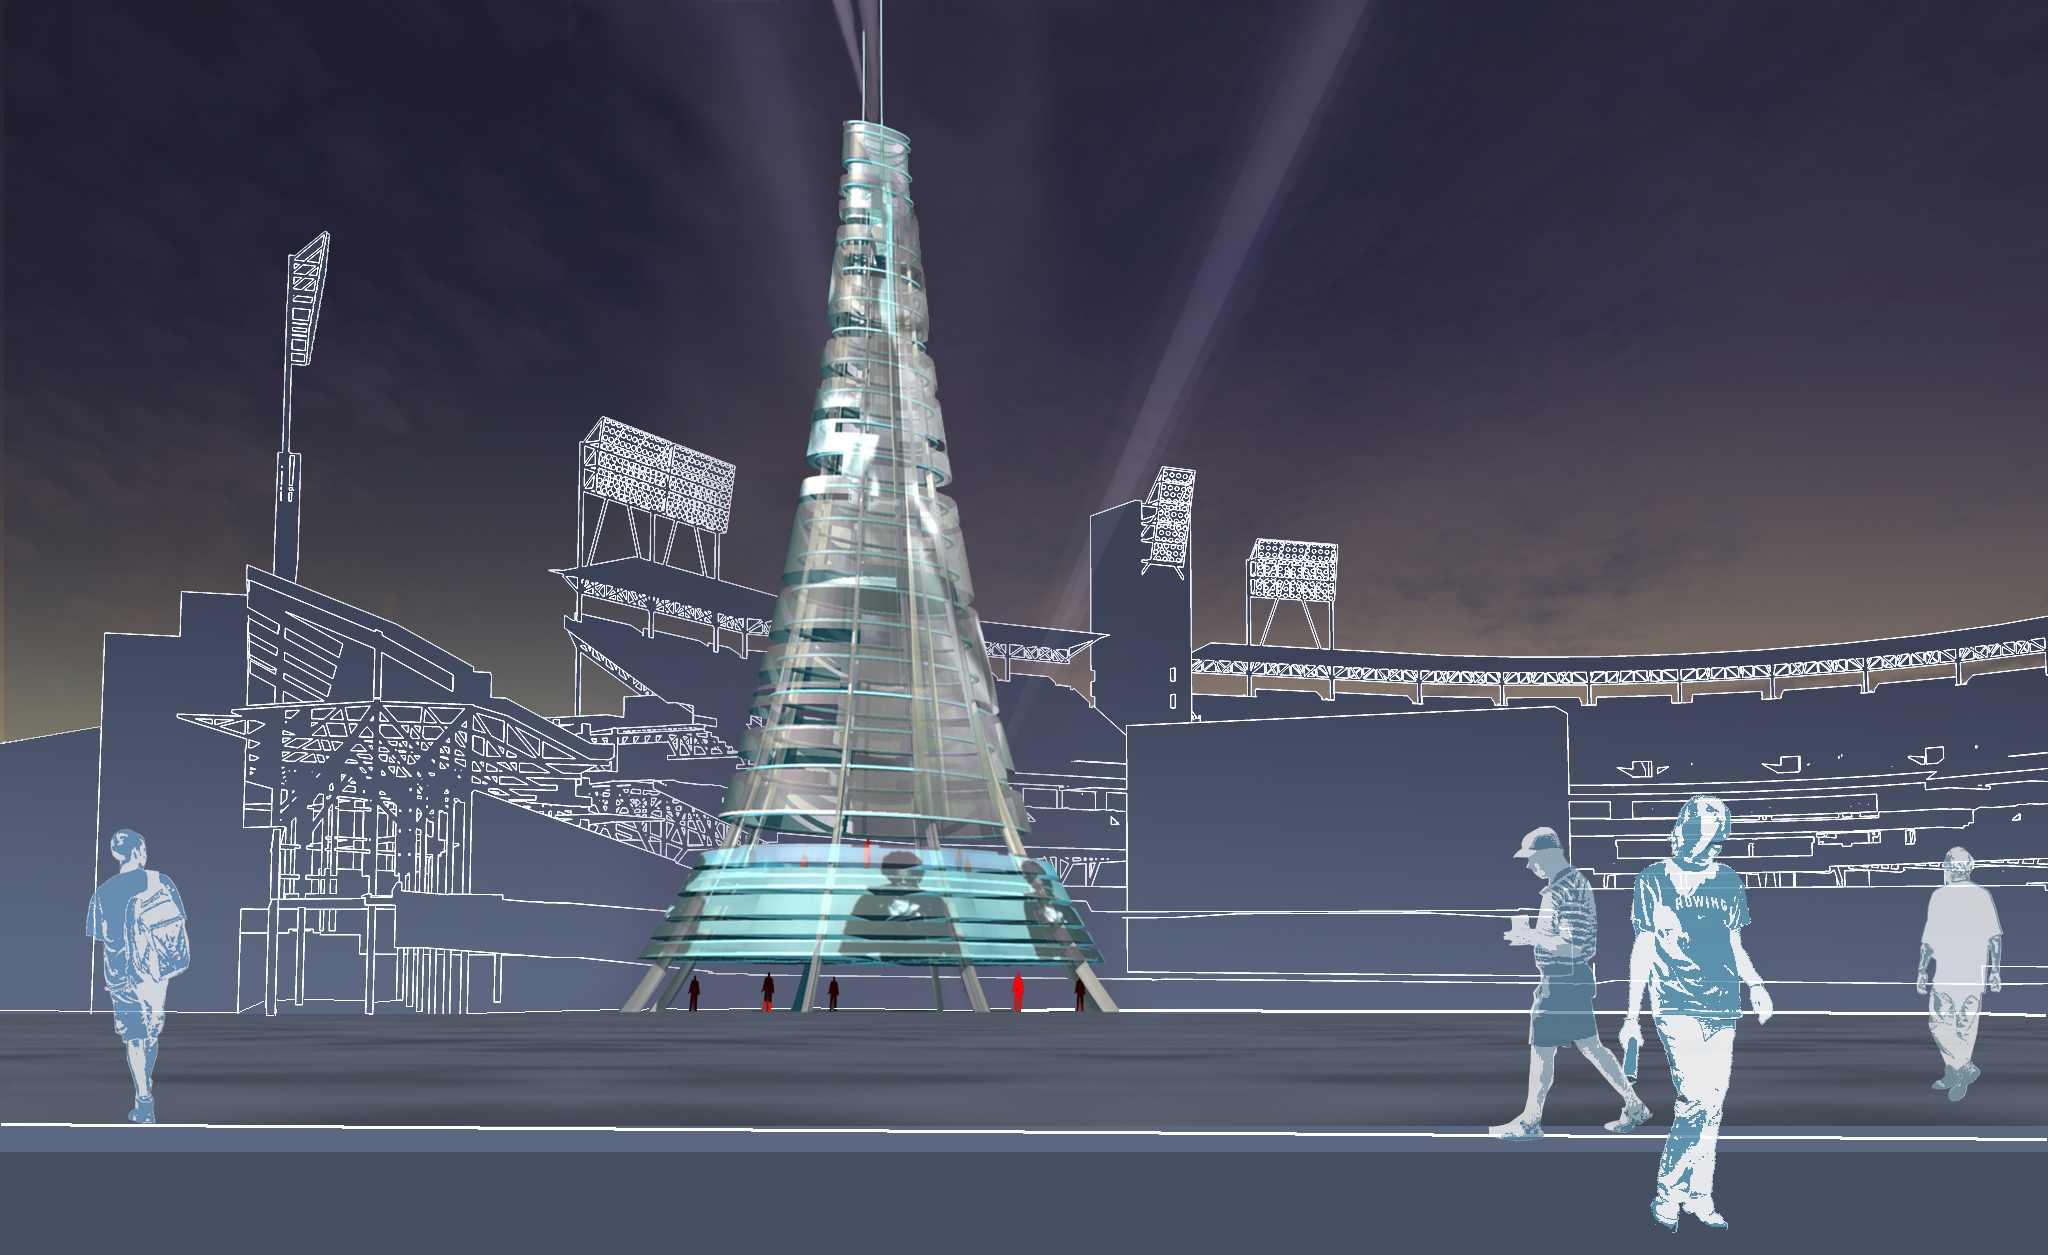 ballpark_tower copy.jpg